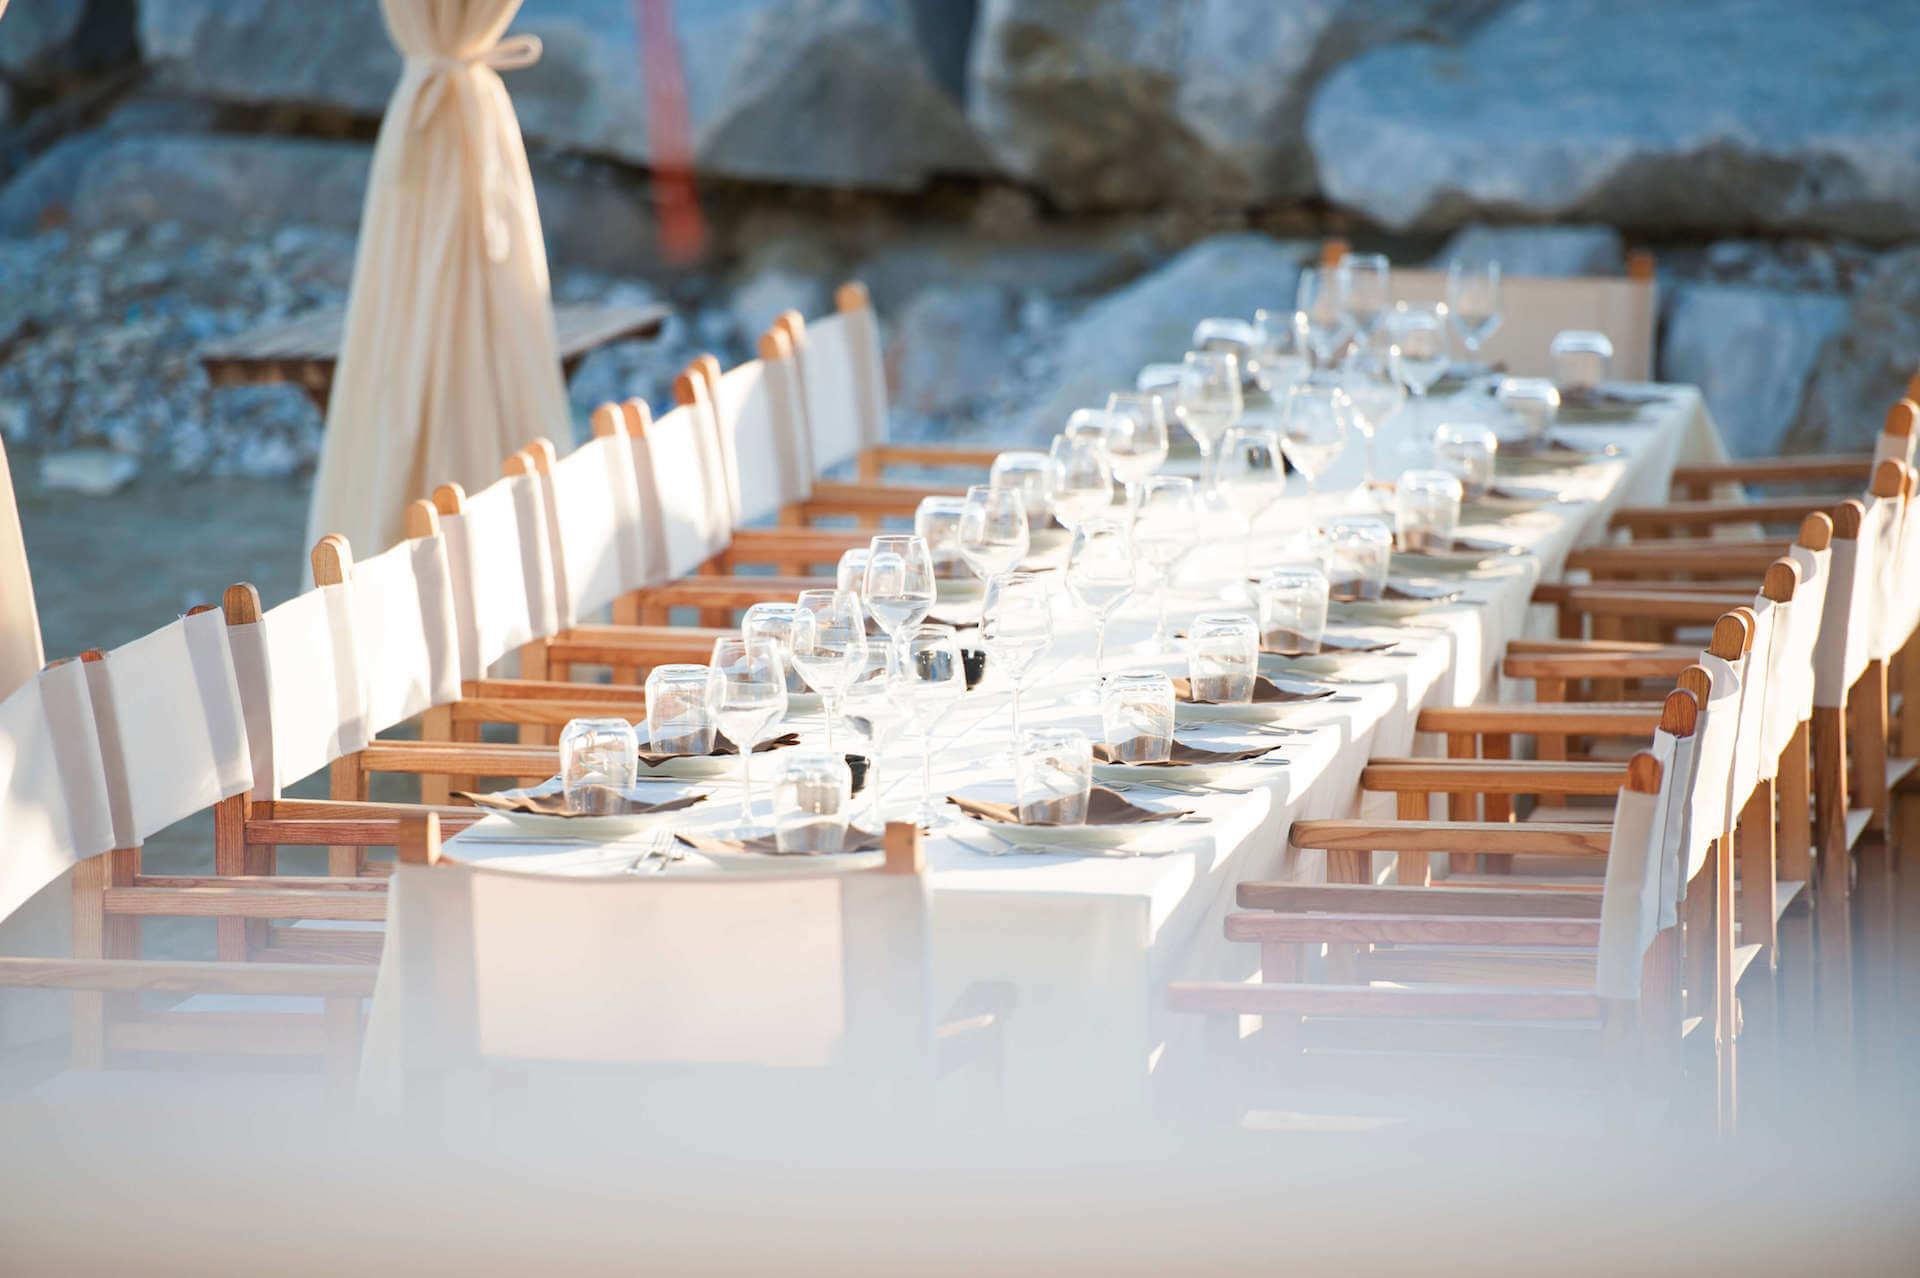 ristorante bagno italia marina di pisa - 28 images - photo4 jpg foto ...